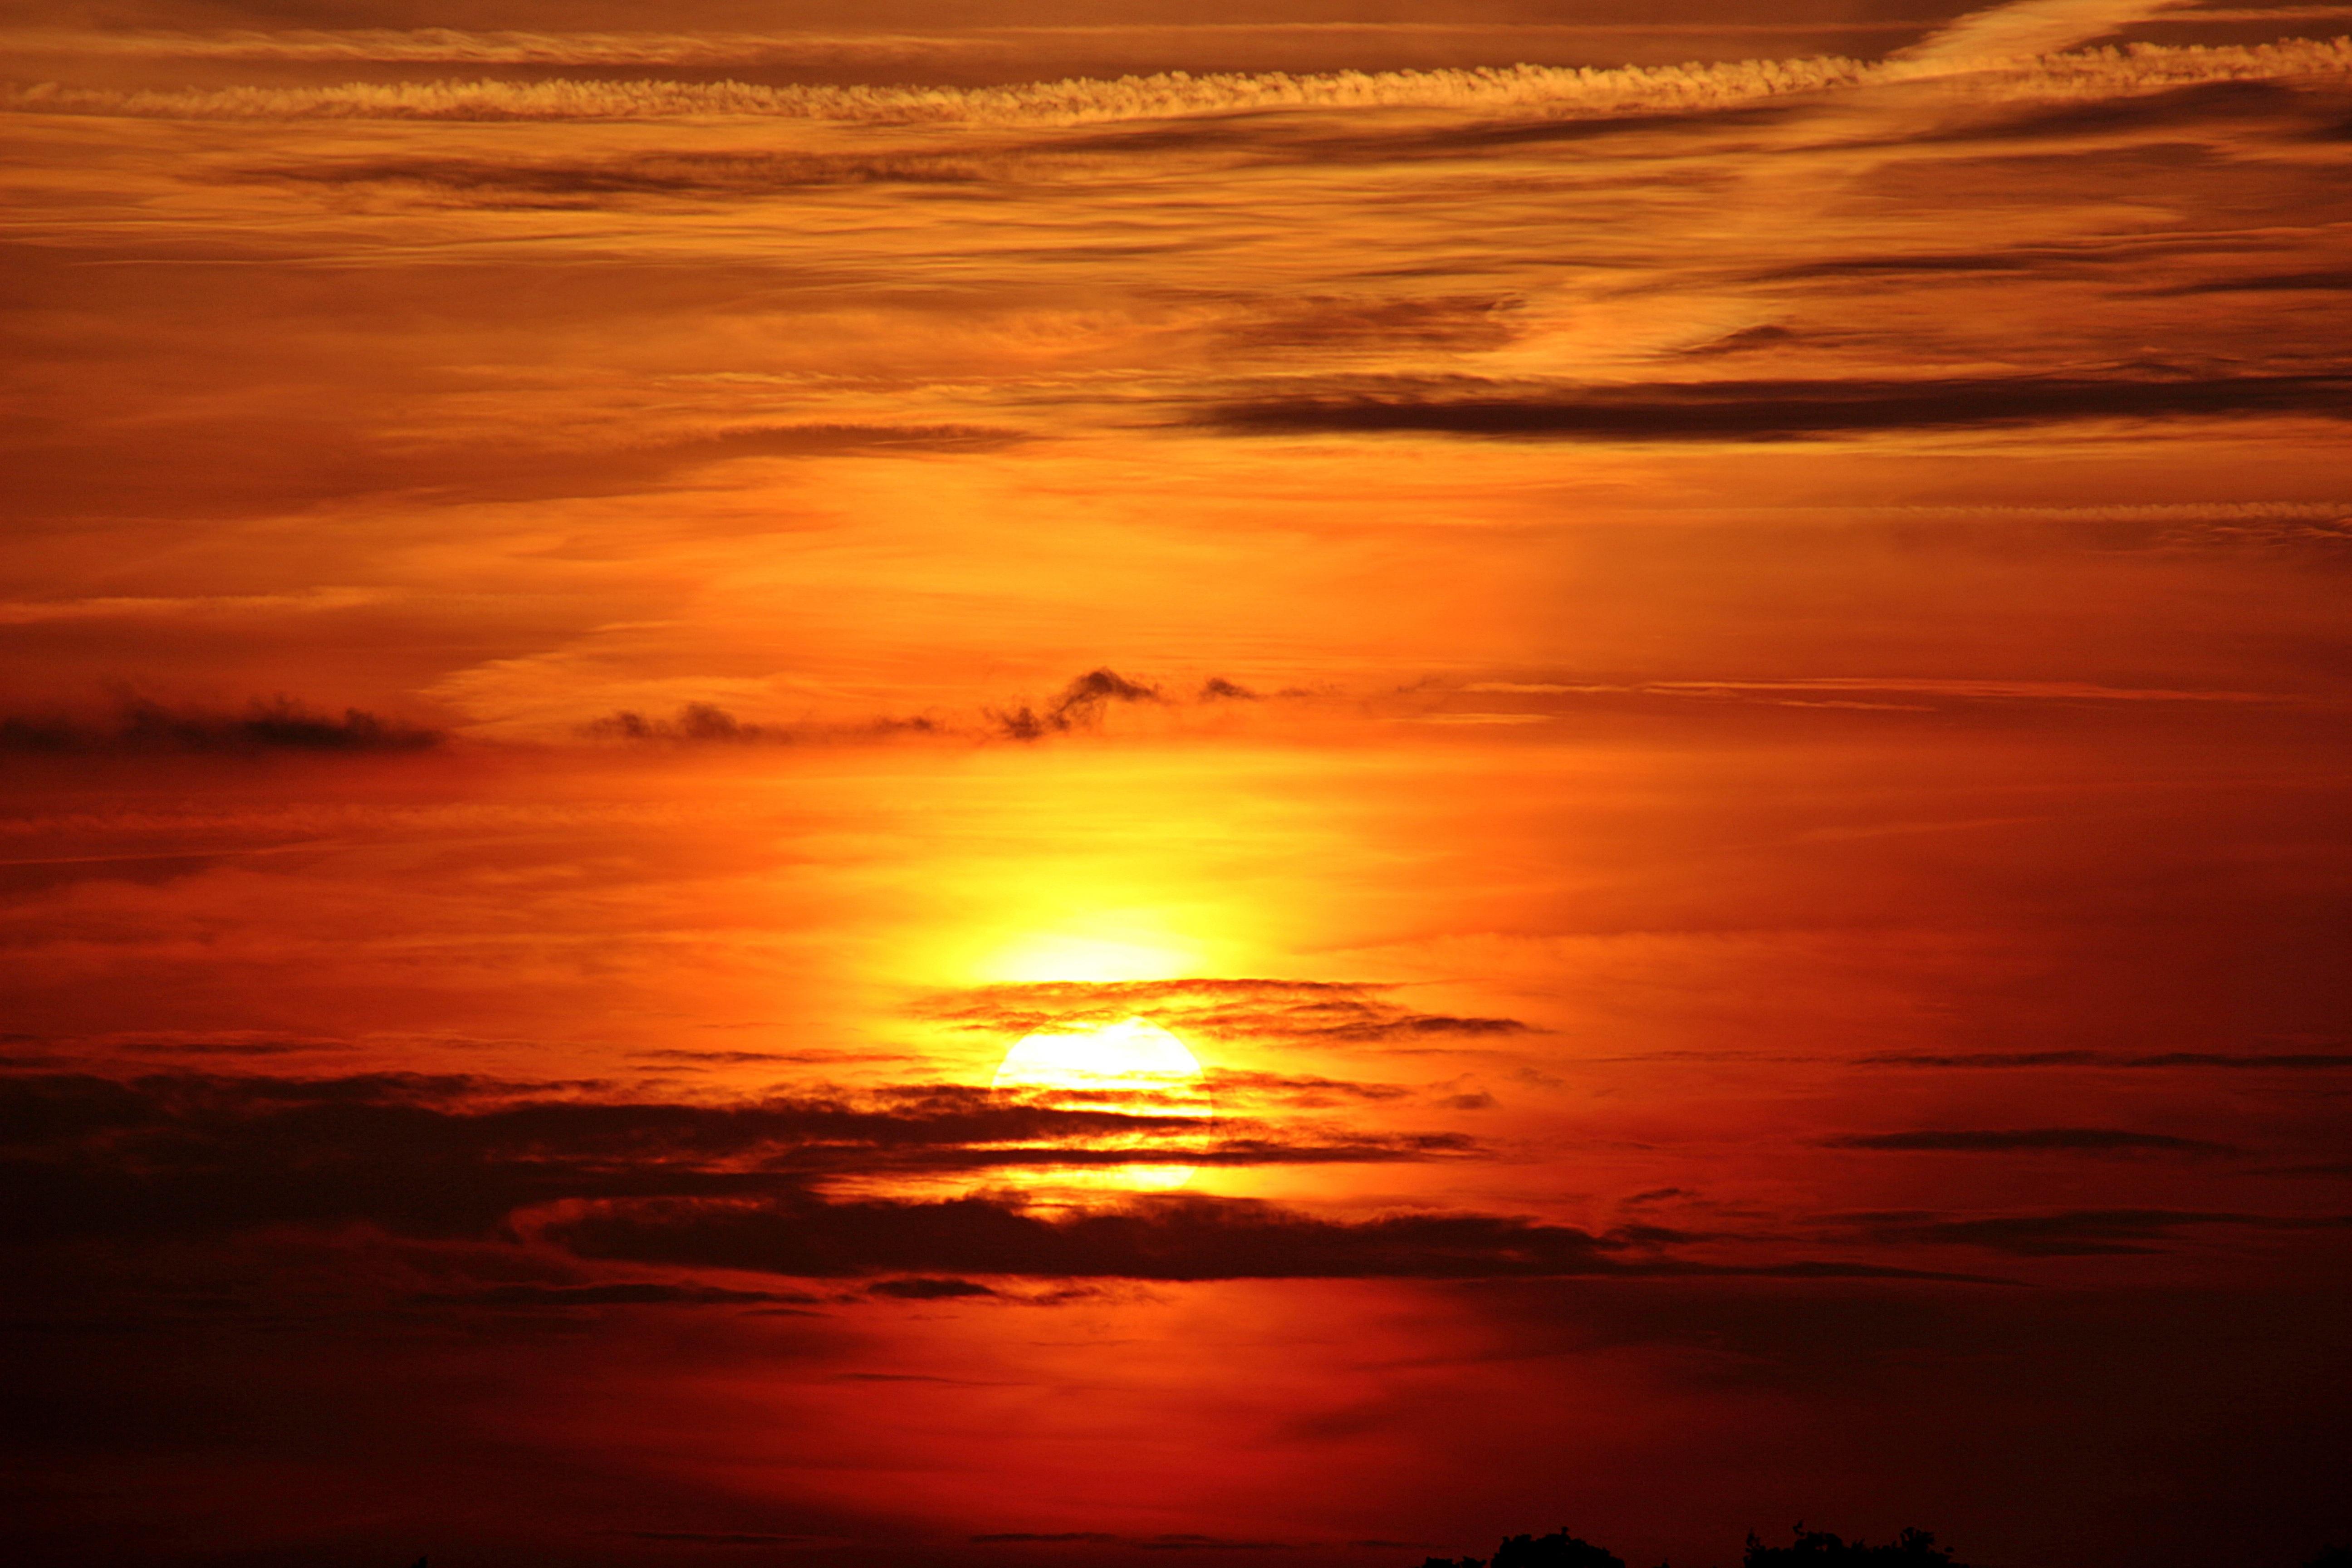 sunset-1520615